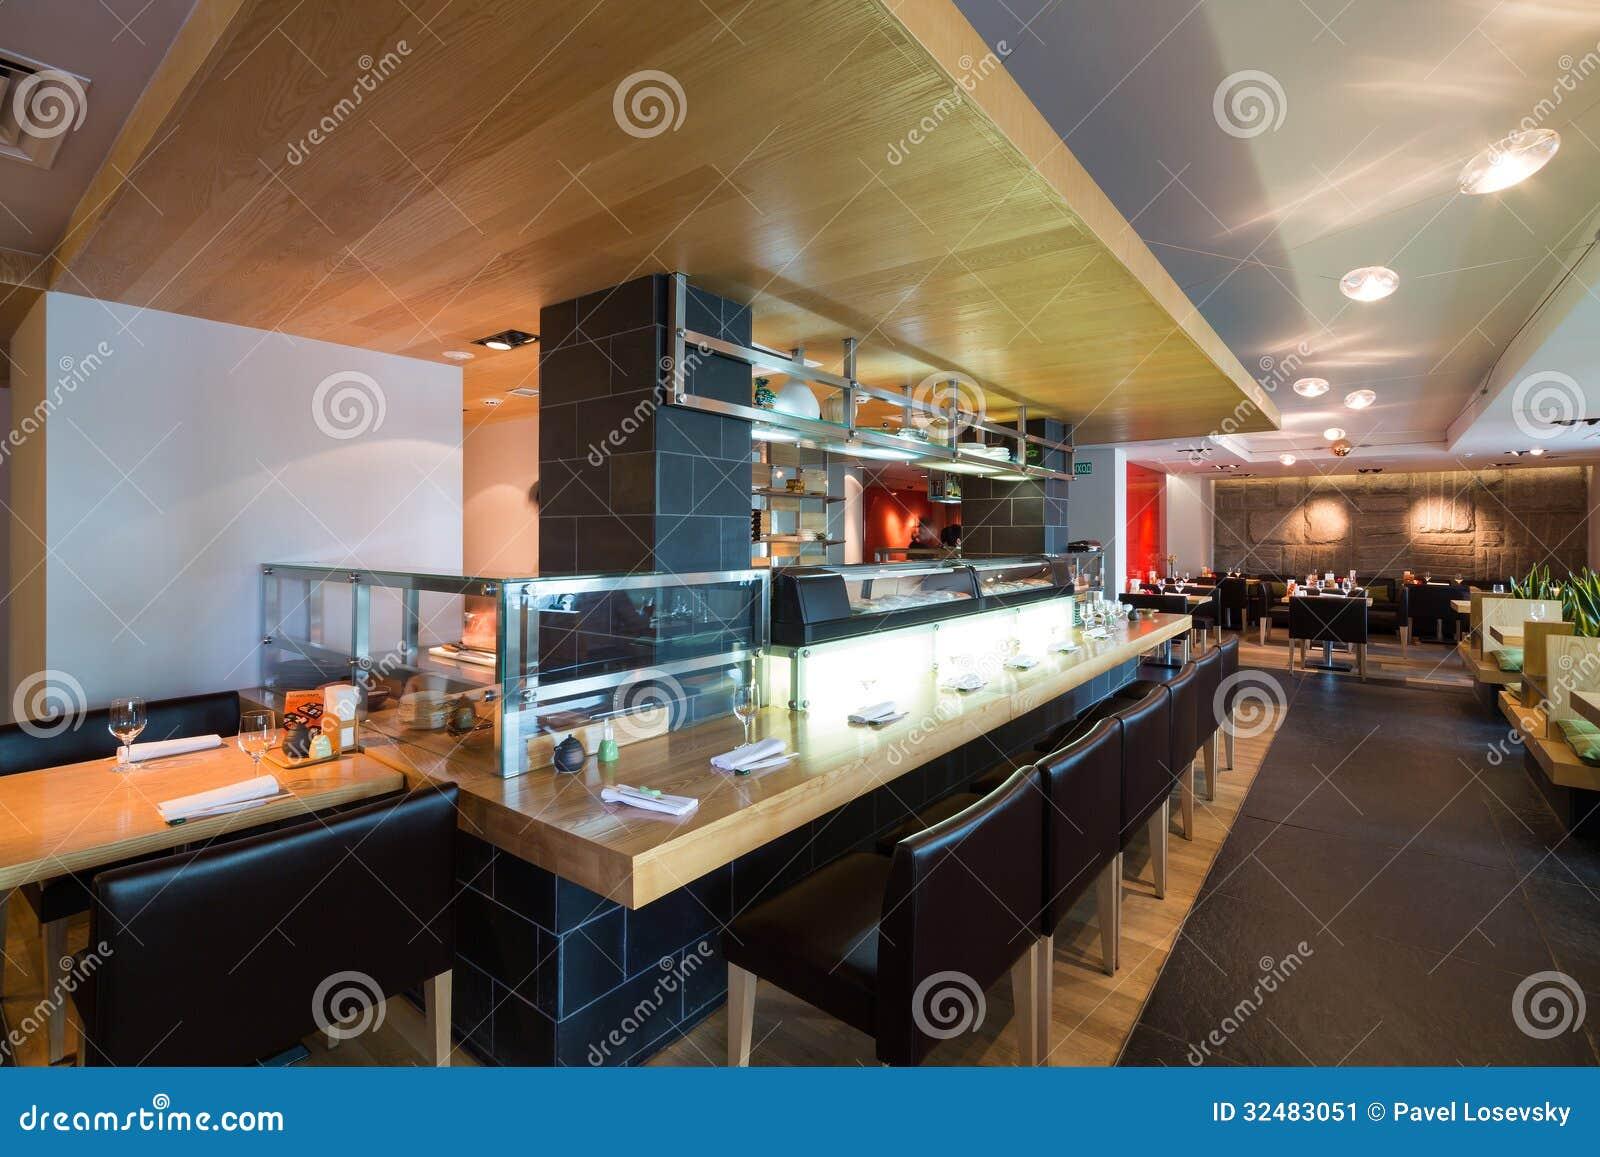 the cozy cafe stock image image of cozy elegant close 32483051